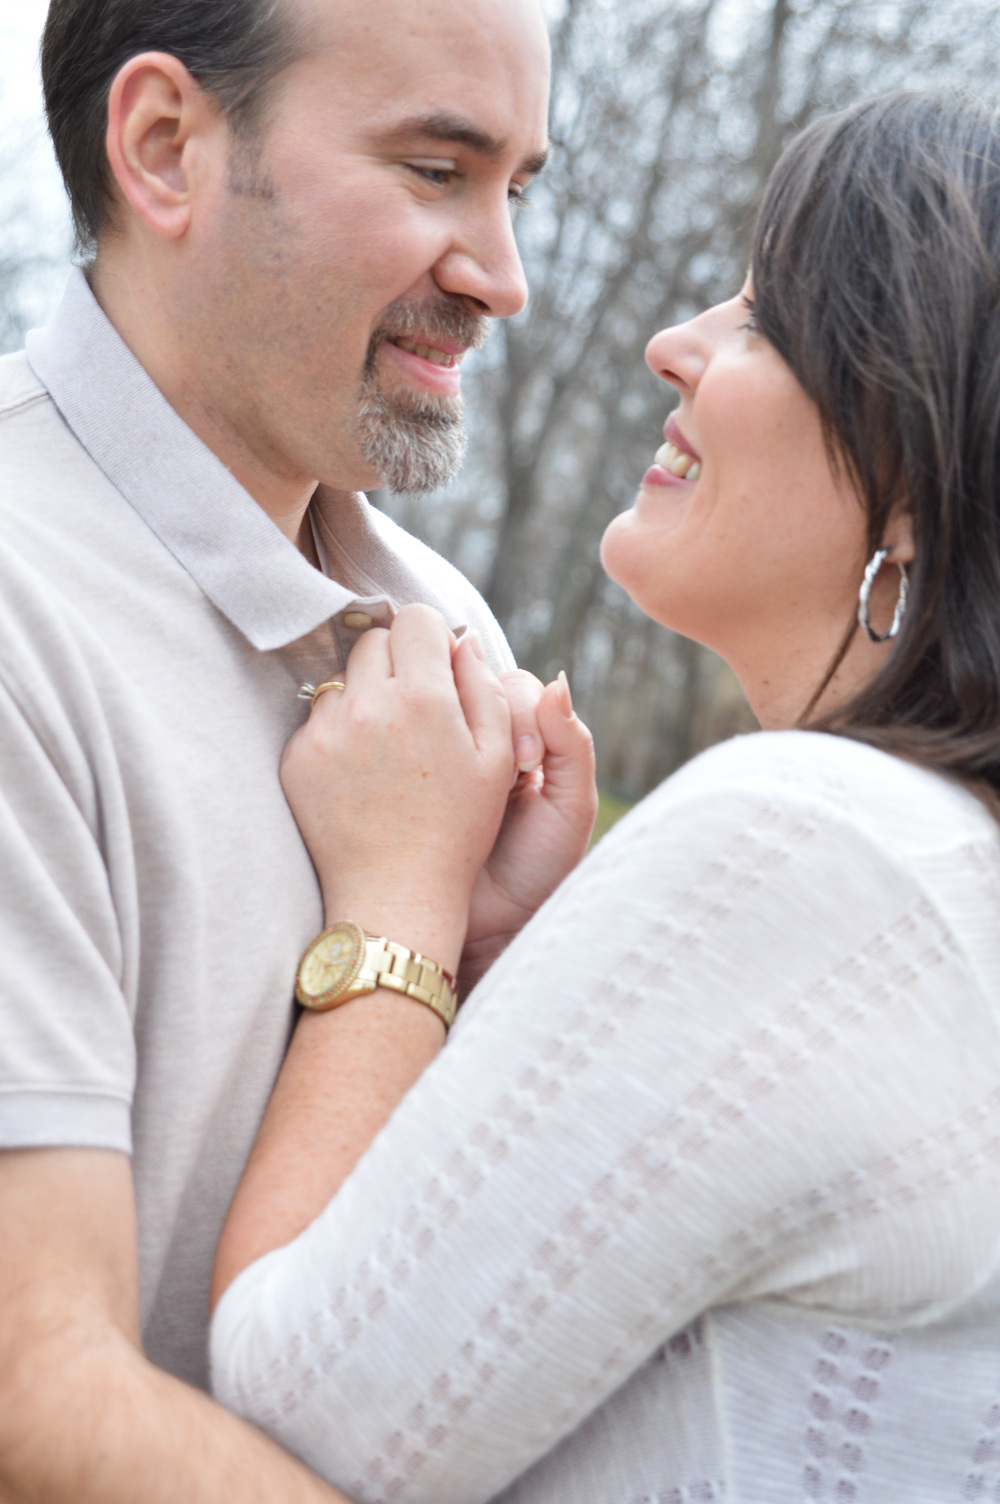 inloveforever-couplesphotography-familyphotos-joplinmissouri-photosbyariel